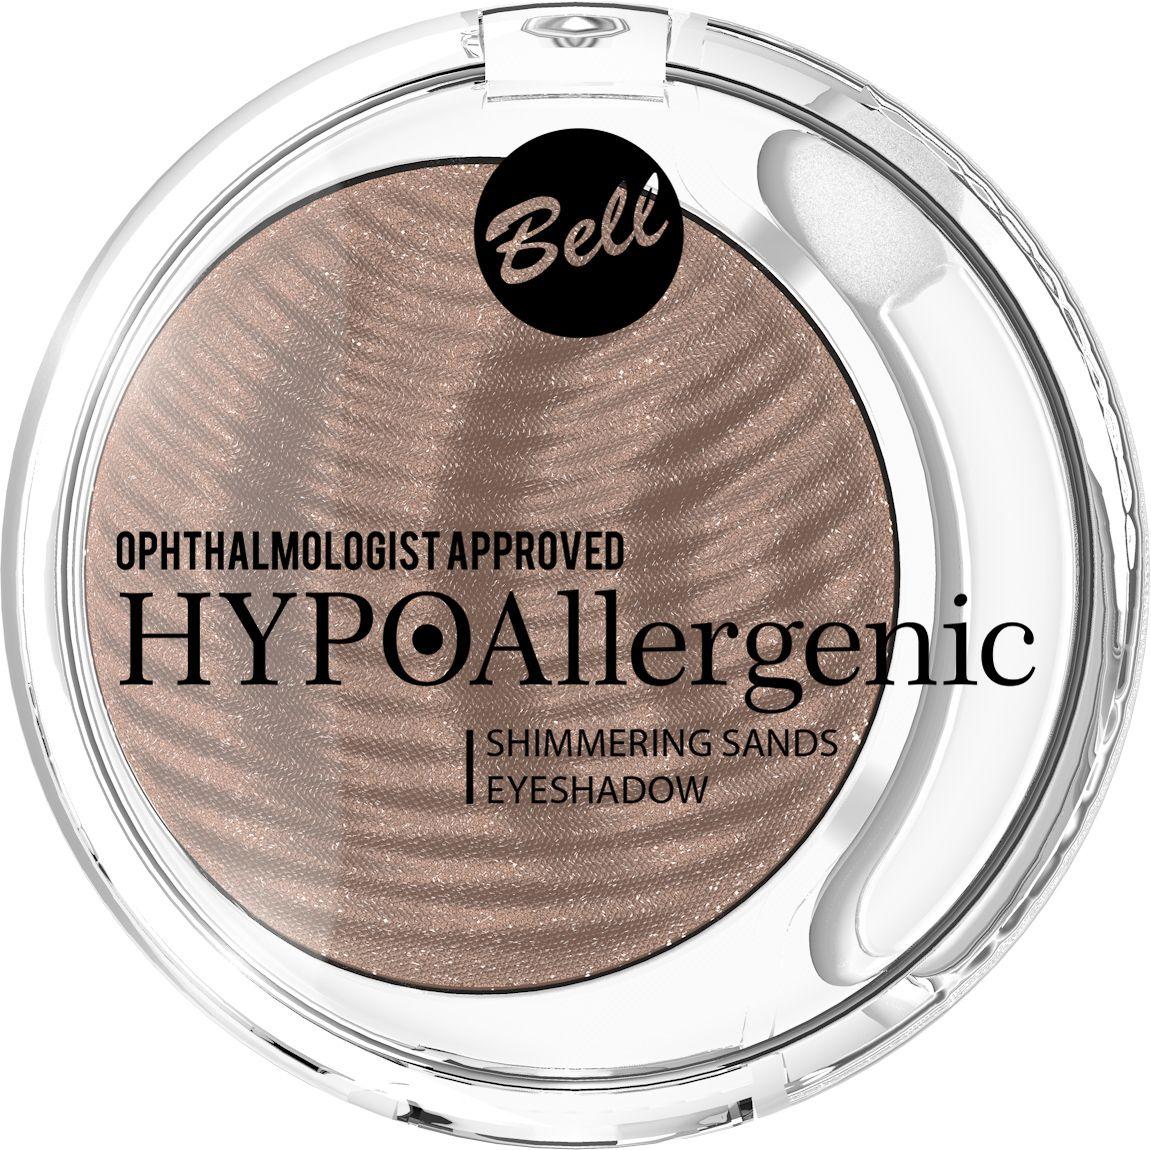 Bell Hypoallergenic Кремовые тени для век Shimmering Sands Eyeshadow, Тон №05BcssHA005